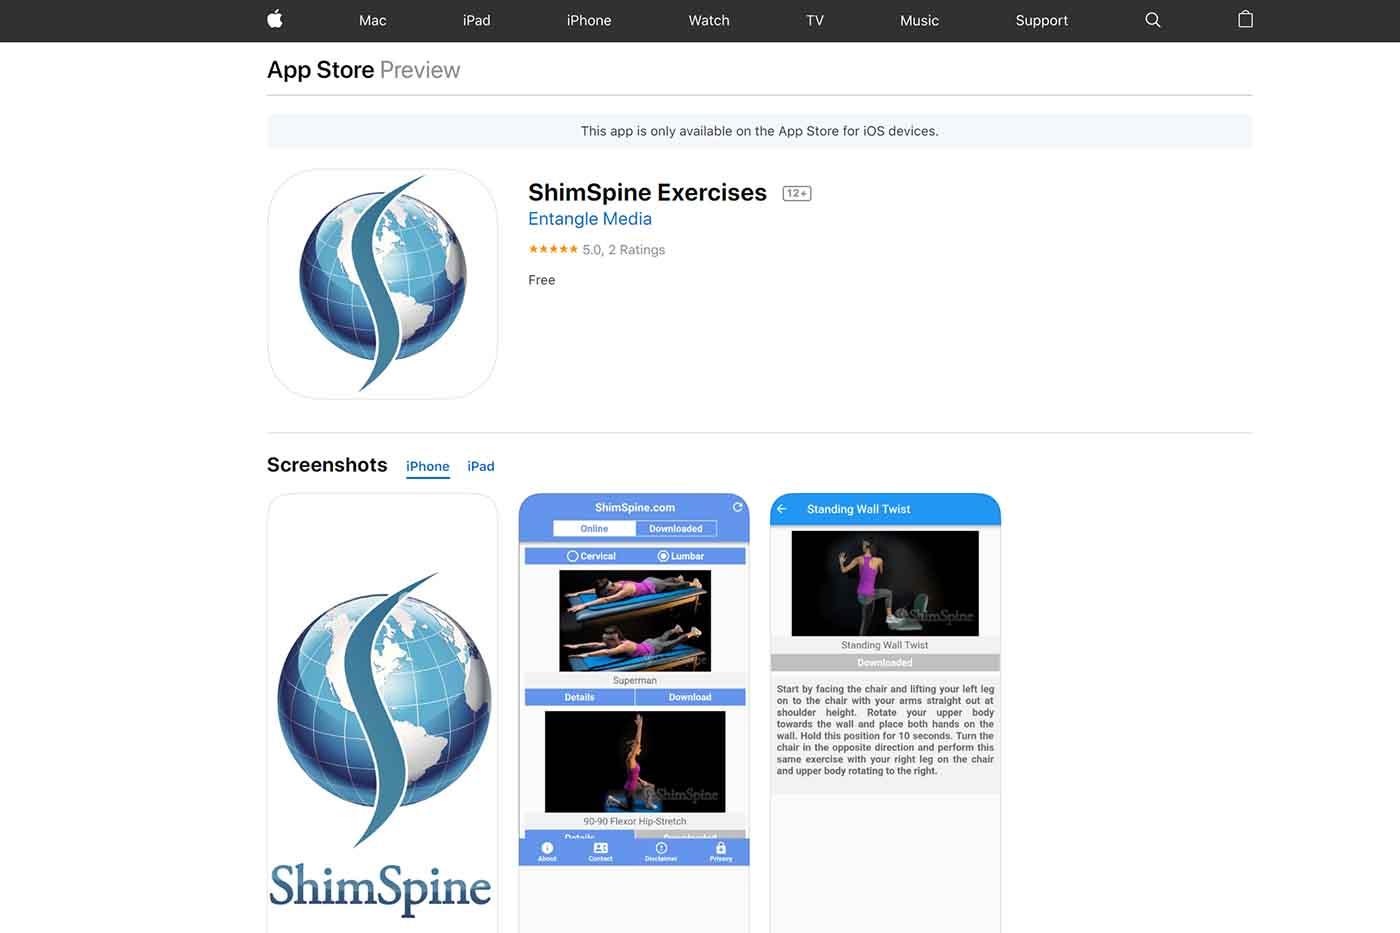 ShimSpine Exercises App